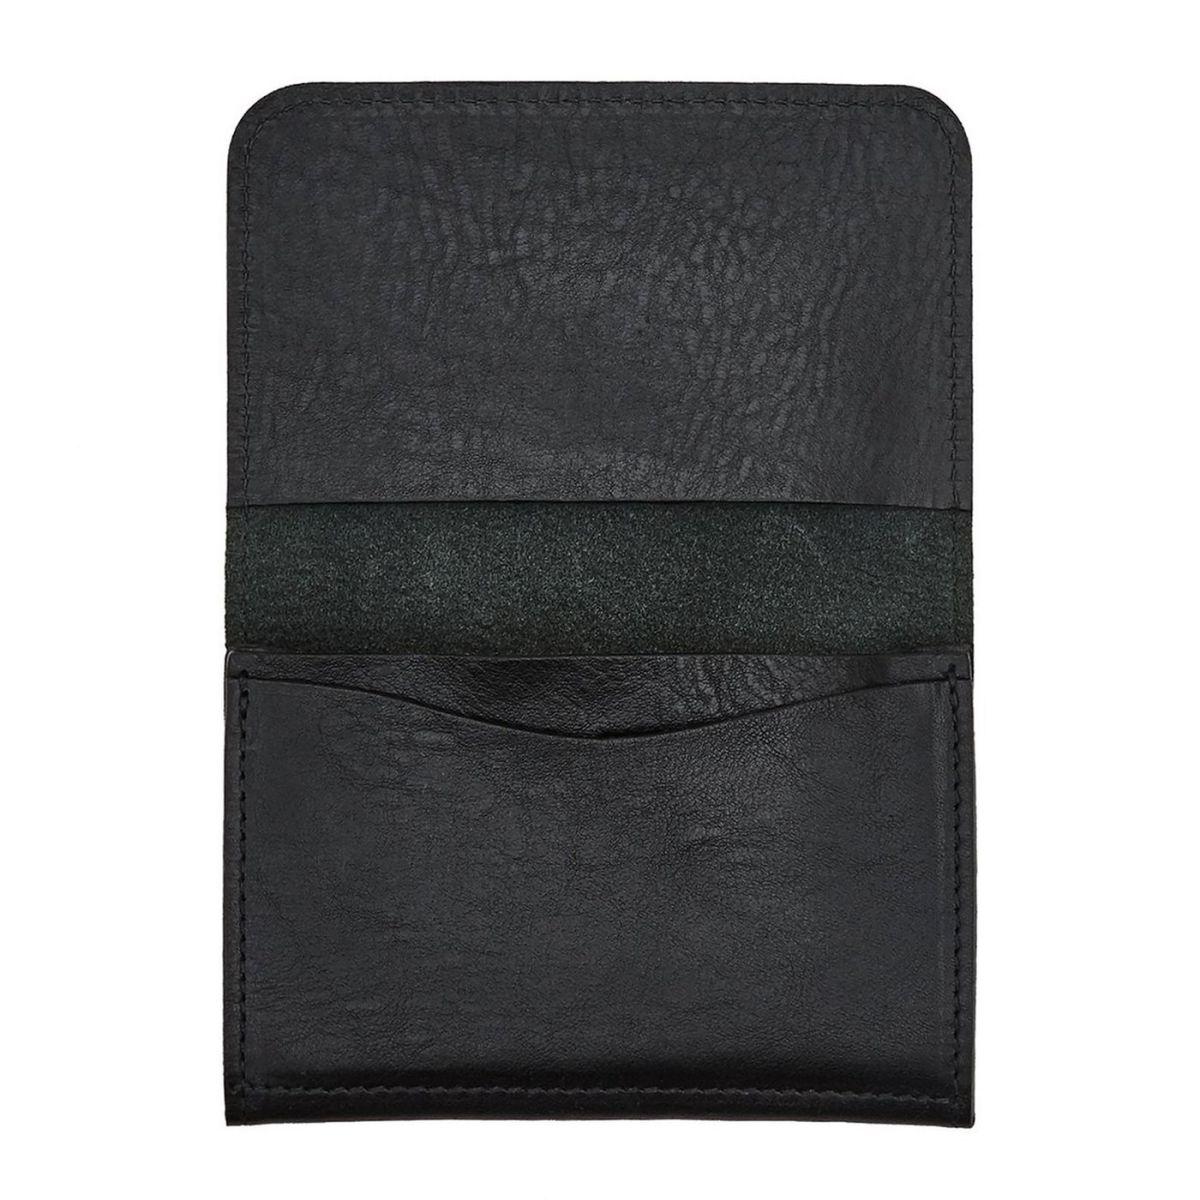 Card Case in Cowhide Double Leather color Black - SCC004 | Details